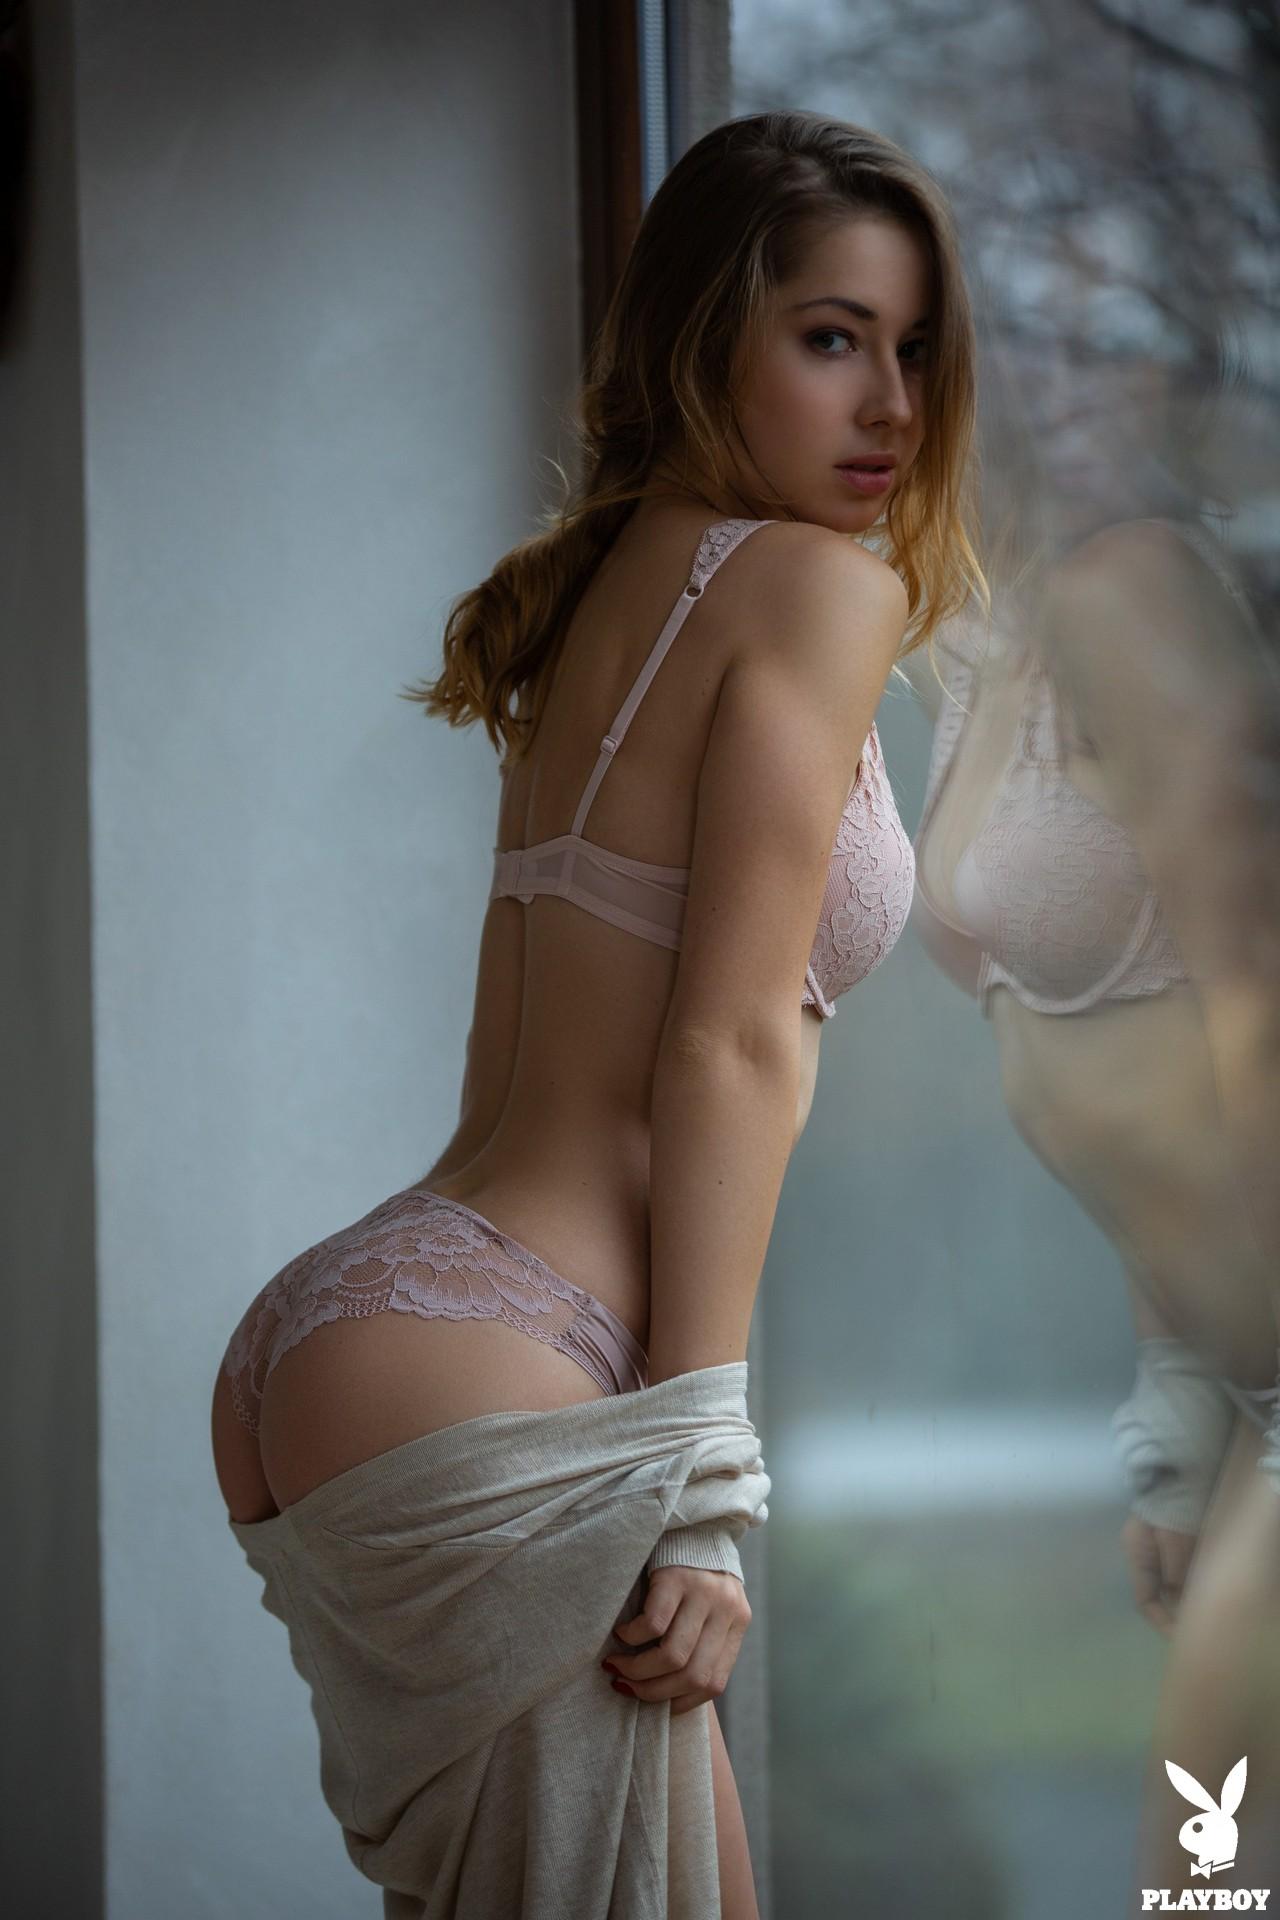 Diana Lark In Pure Innocence Playboy Plus (33)